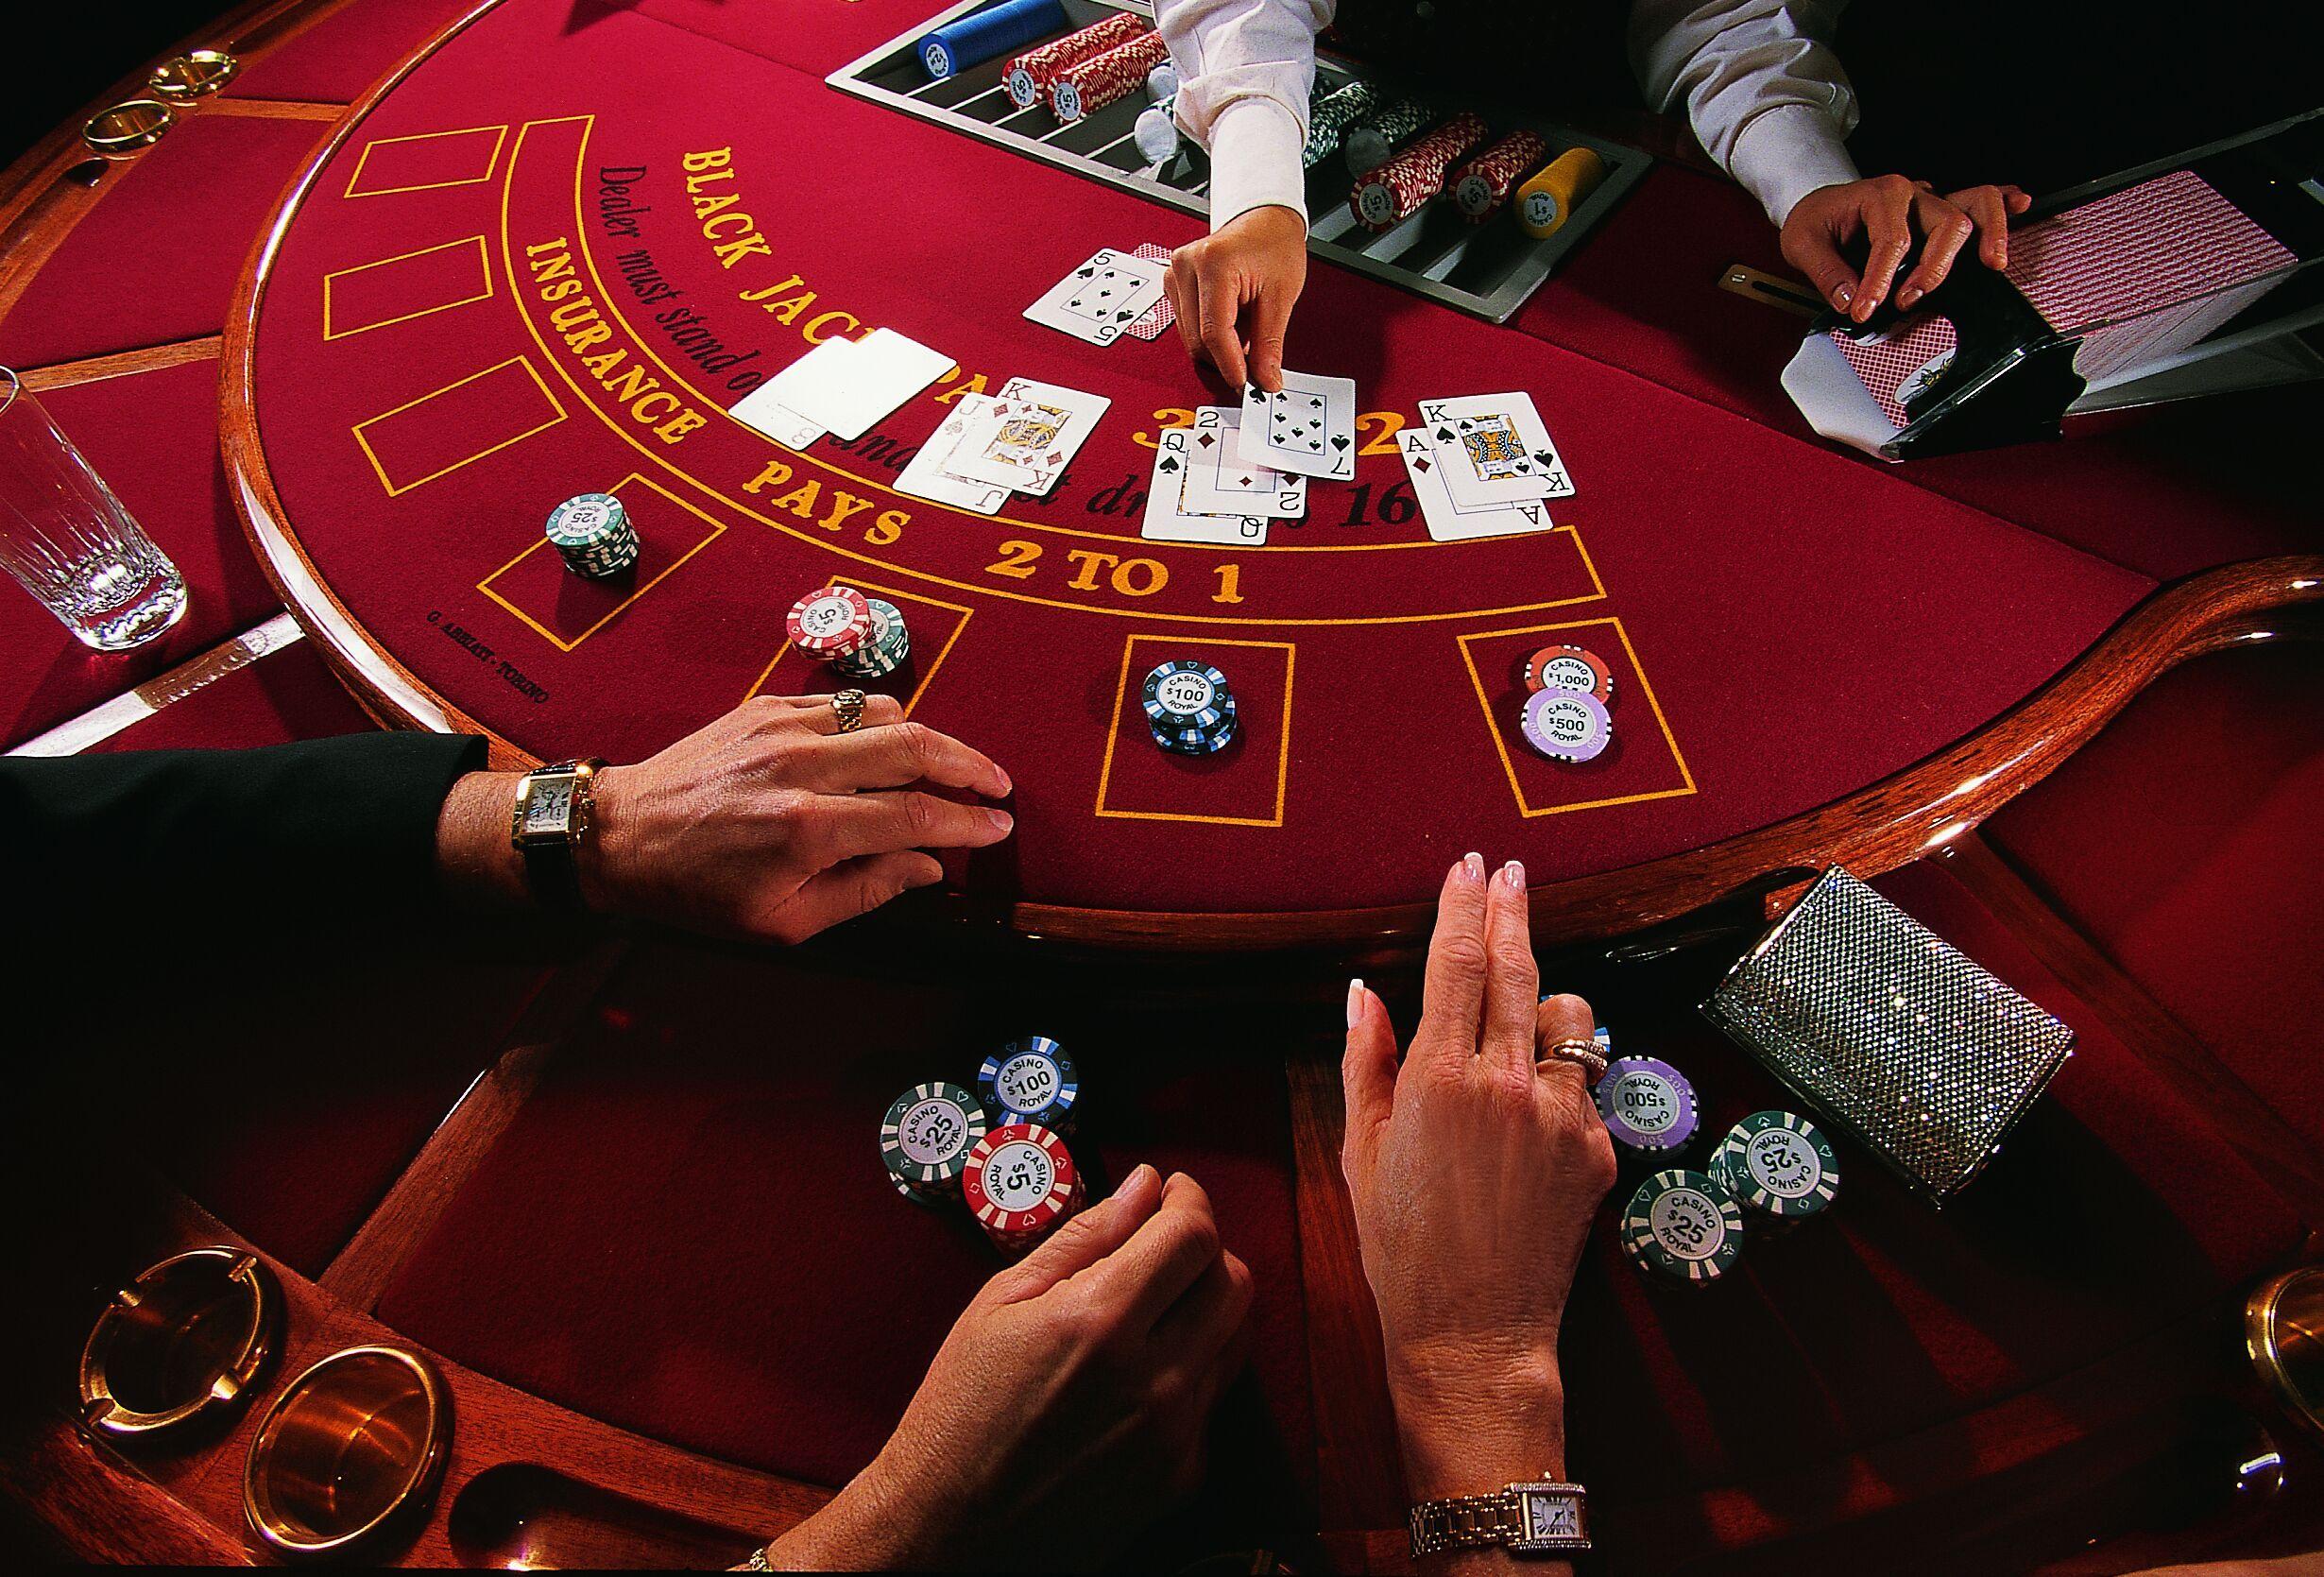 Tilt poker download bonos gratis sin deposito casino Salta-500796